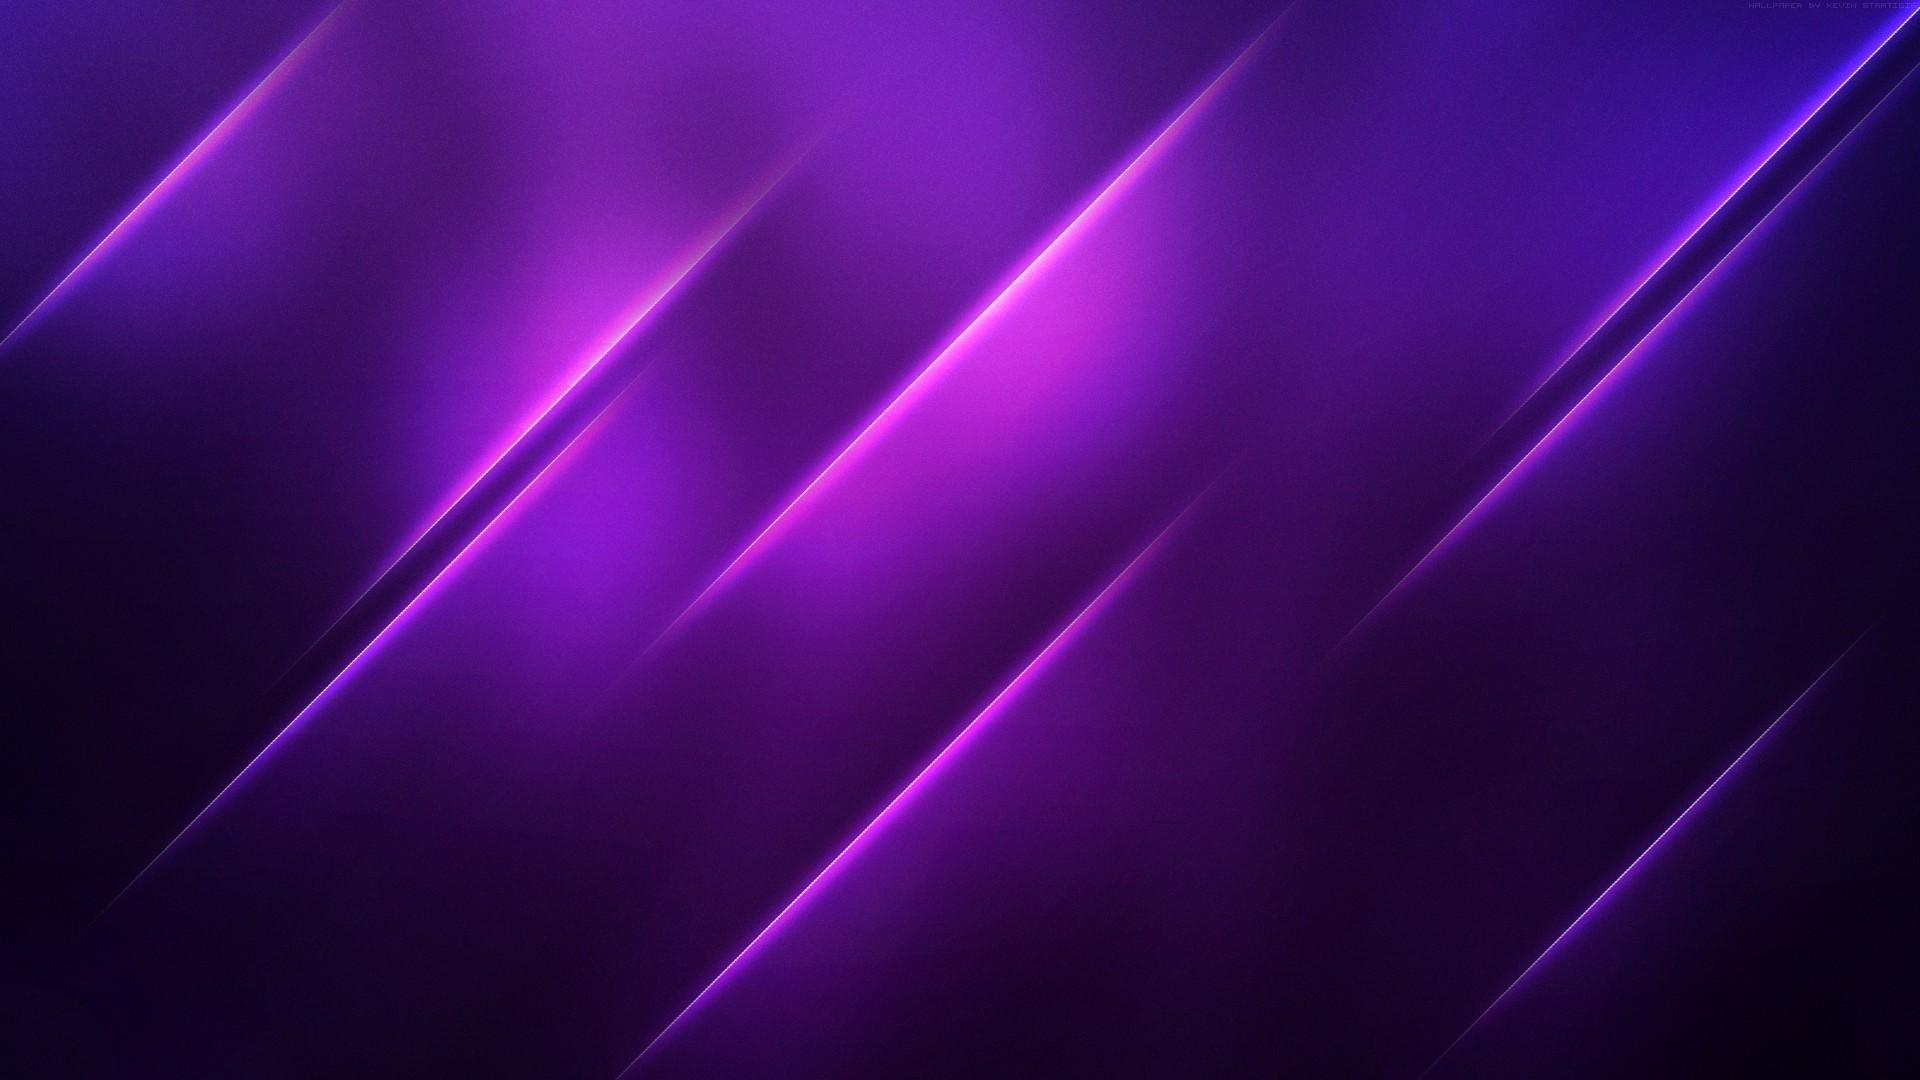 purple backgrounds wallpaper solid purple backgrounds hd wallpaper